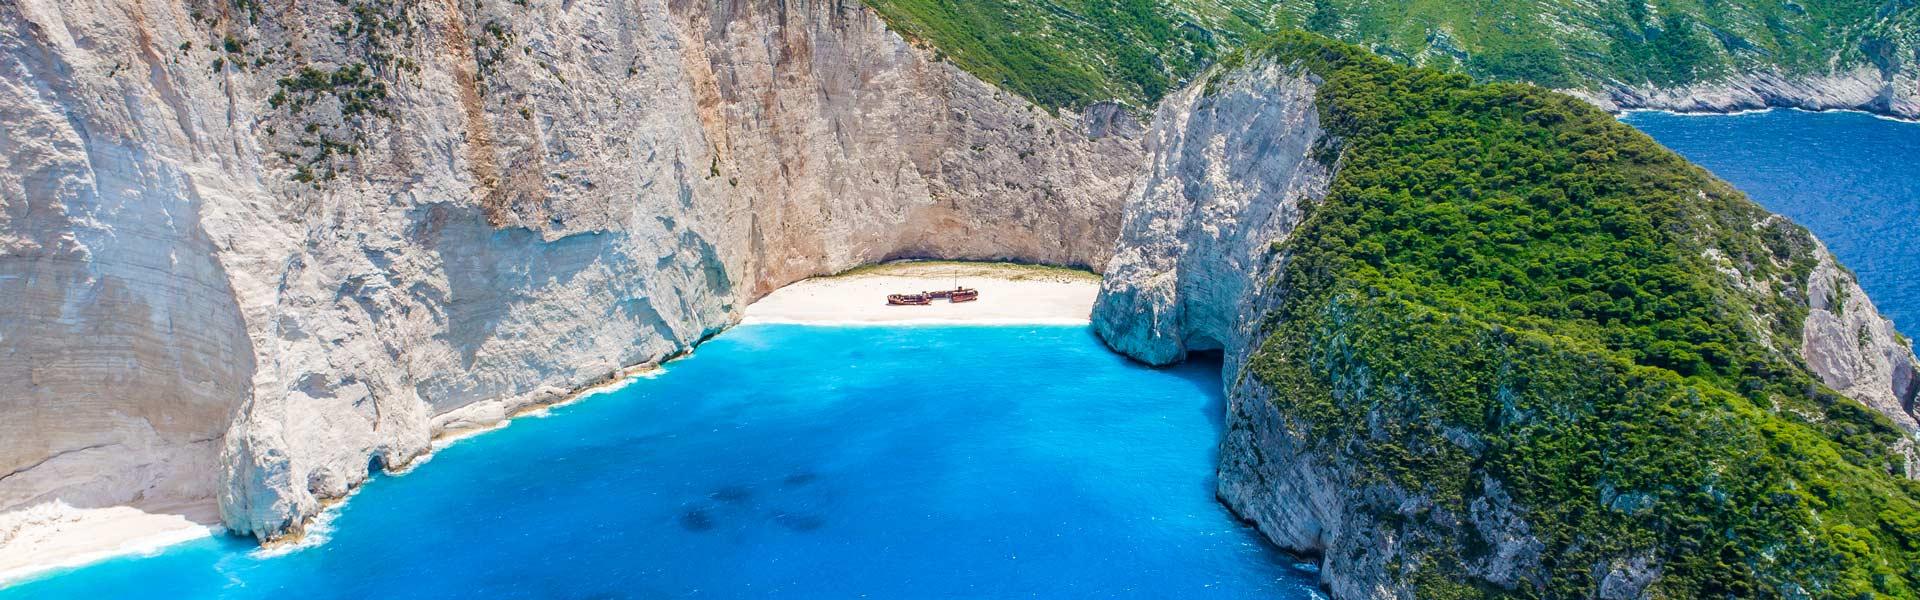 Zakynthos Shipwreck Blue Caves